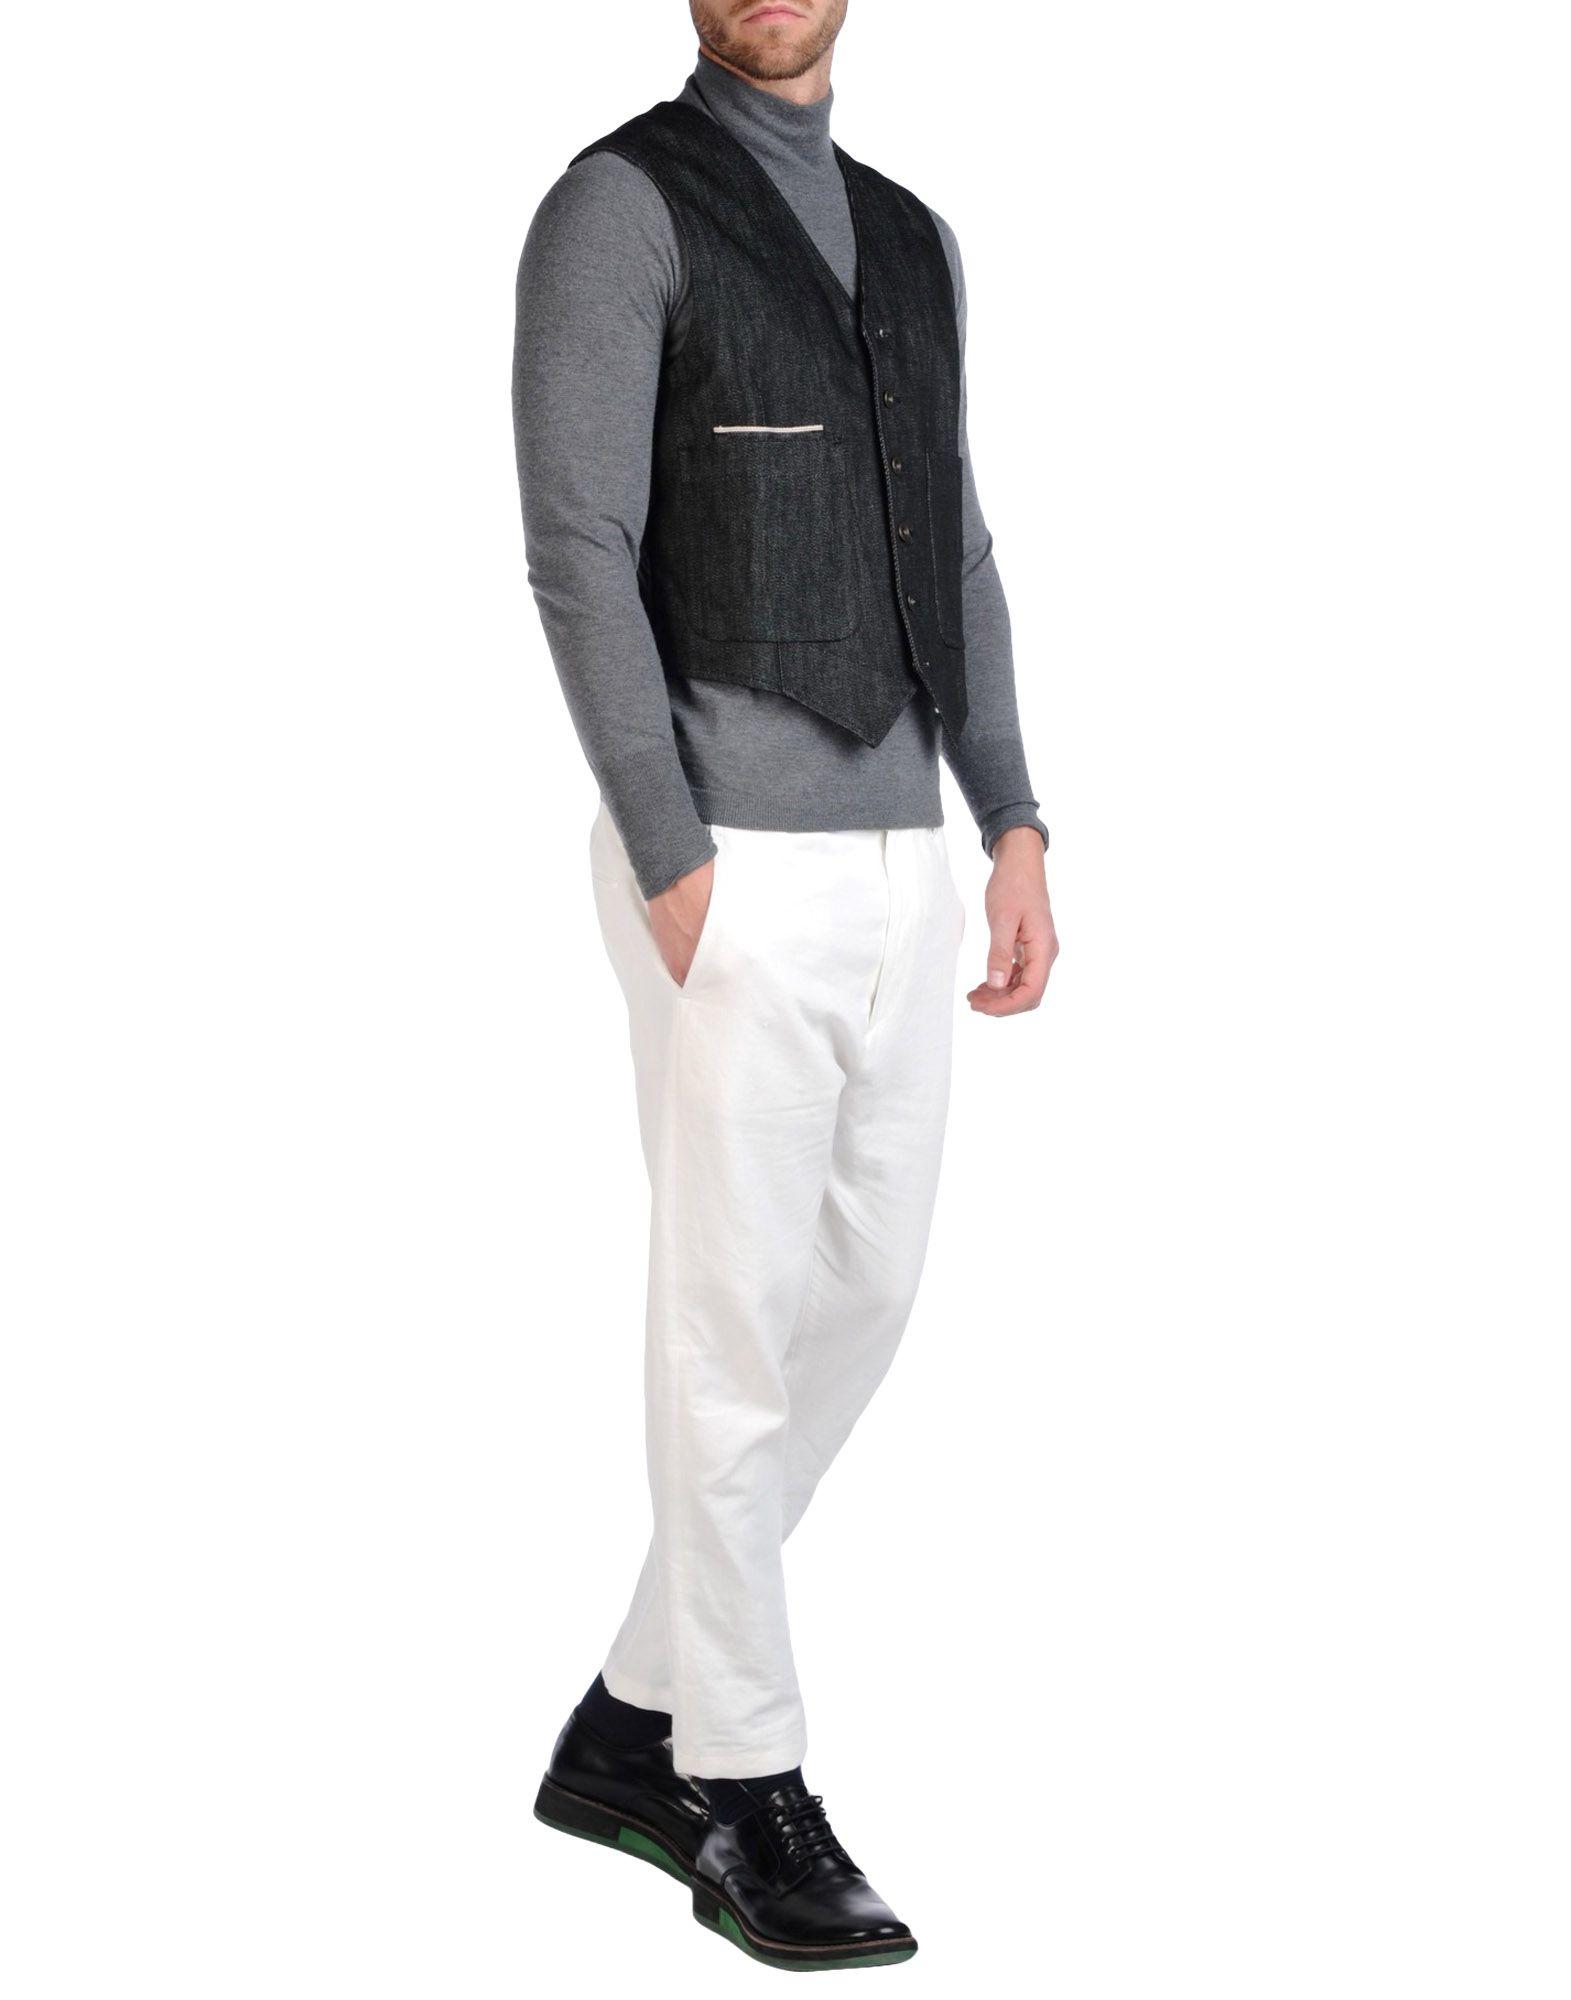 black vest and jeans - photo #29